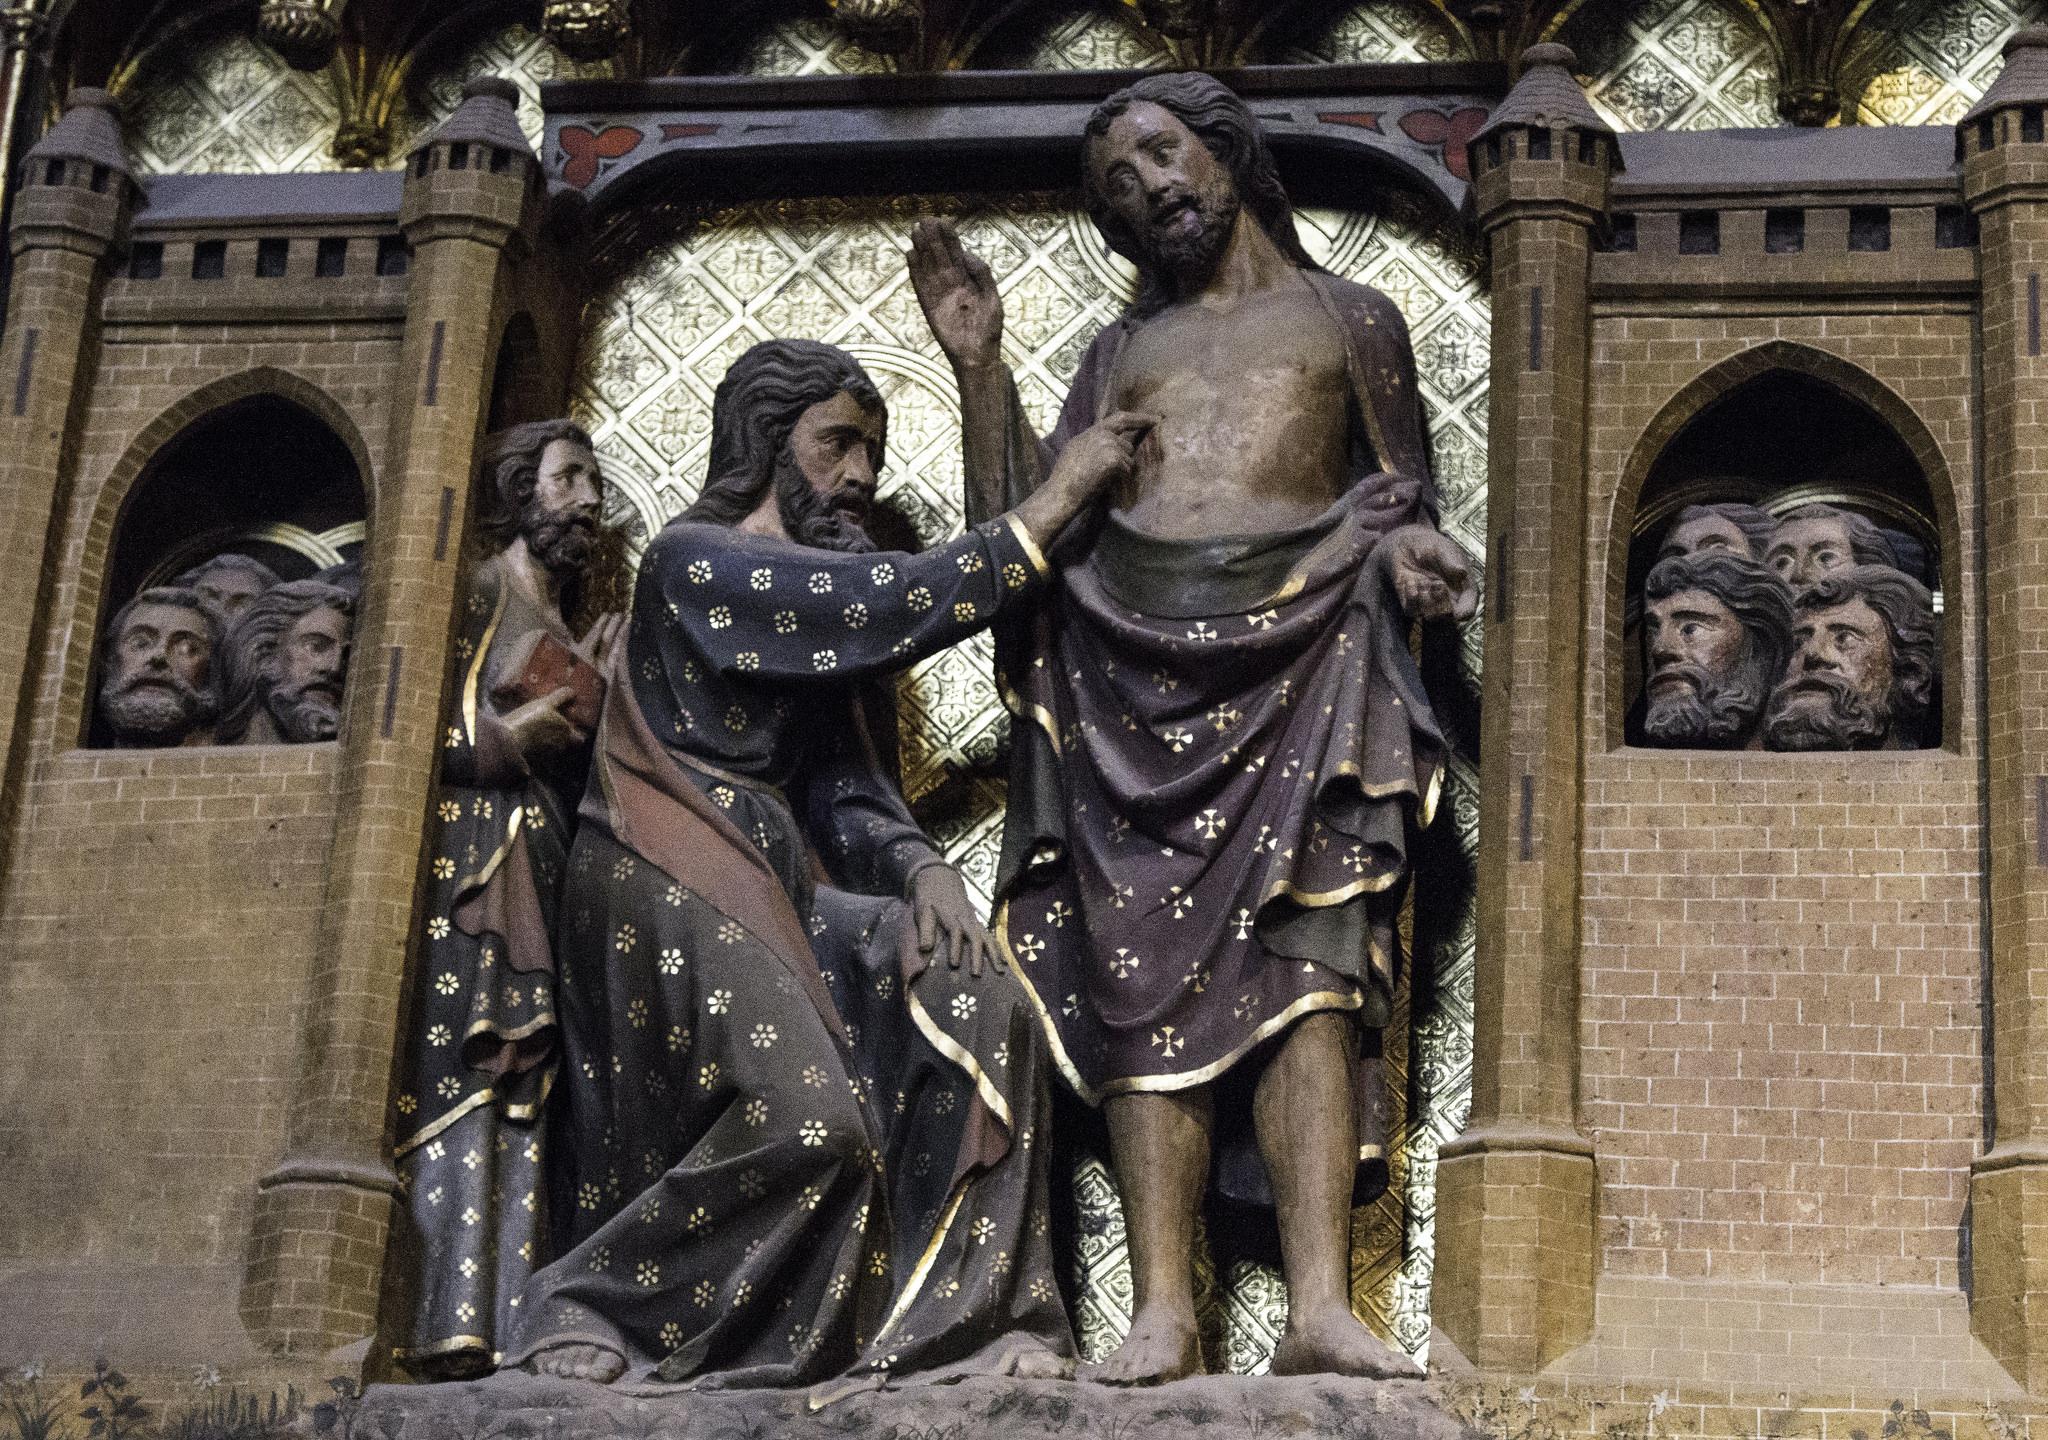 St Thomas sculpture